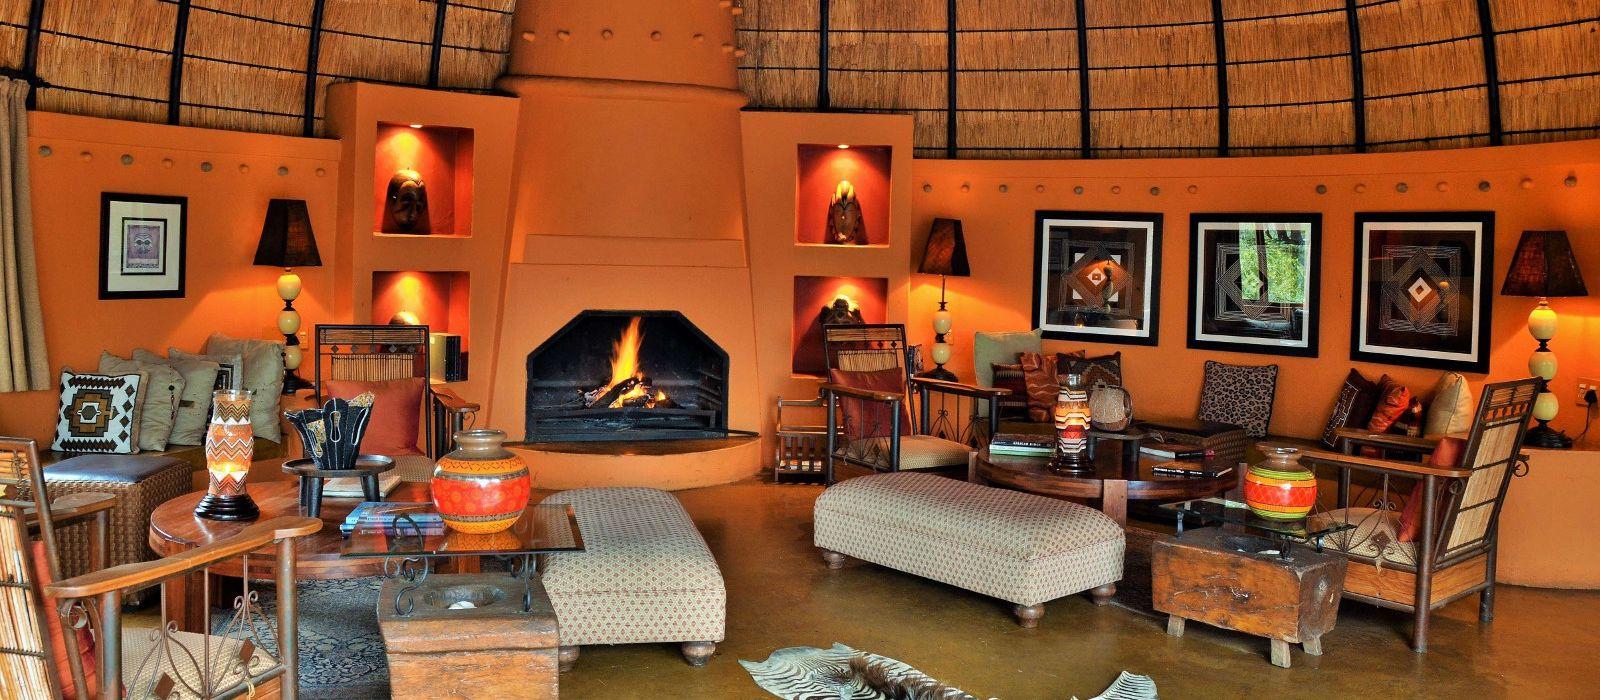 Hotel Hoyo Hoyo Safari Lodge South Africa